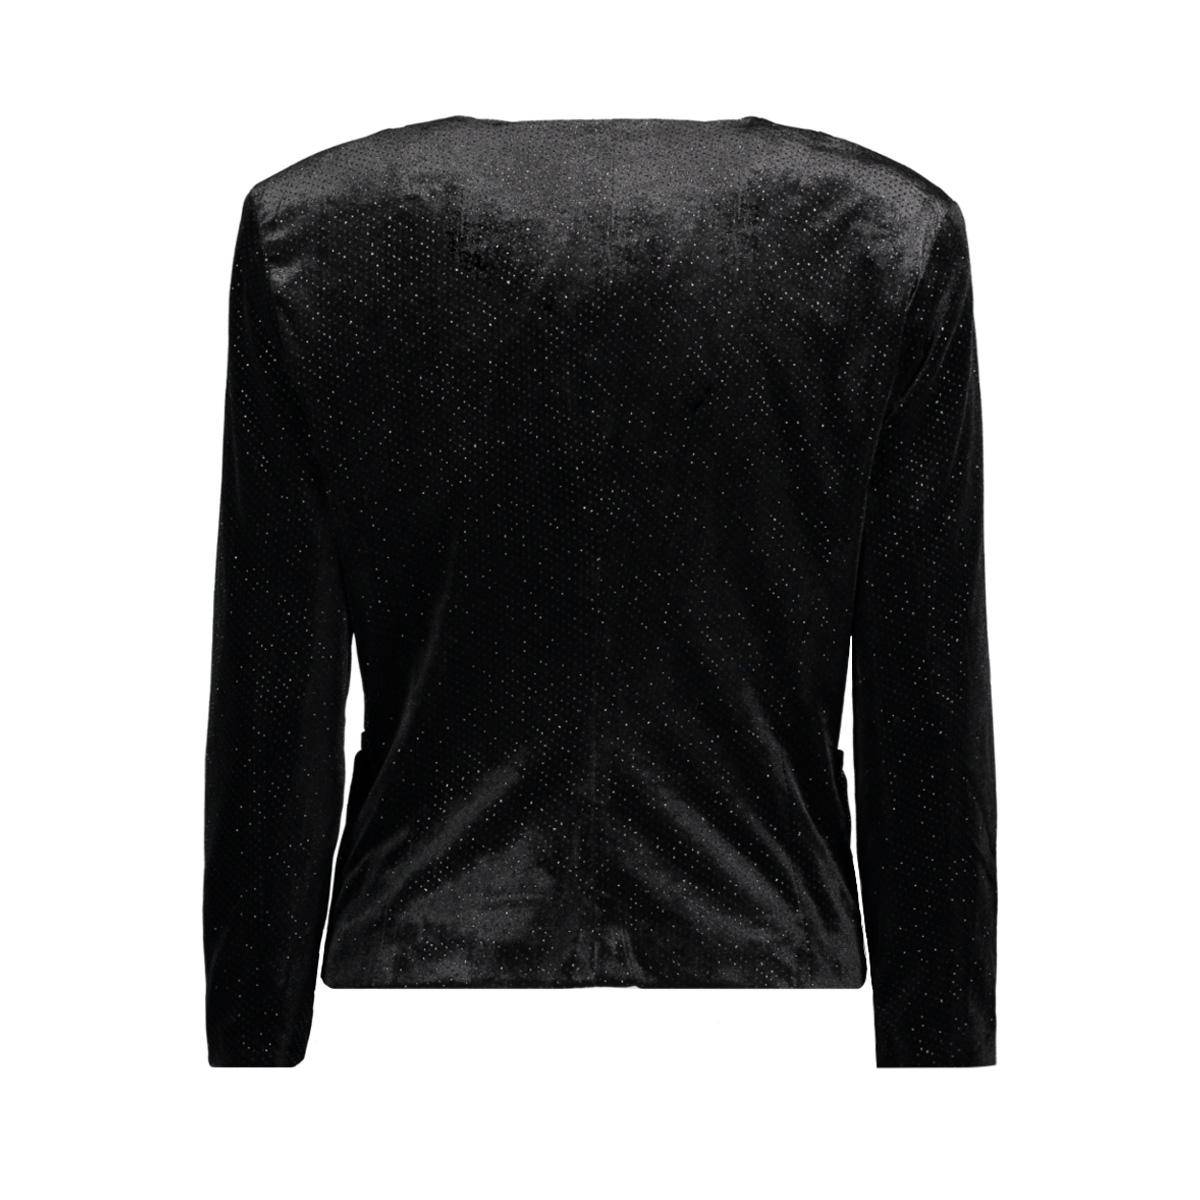 onlchanette velvet 7/8 blazer tlr 15143648 only blazer black/silver gli